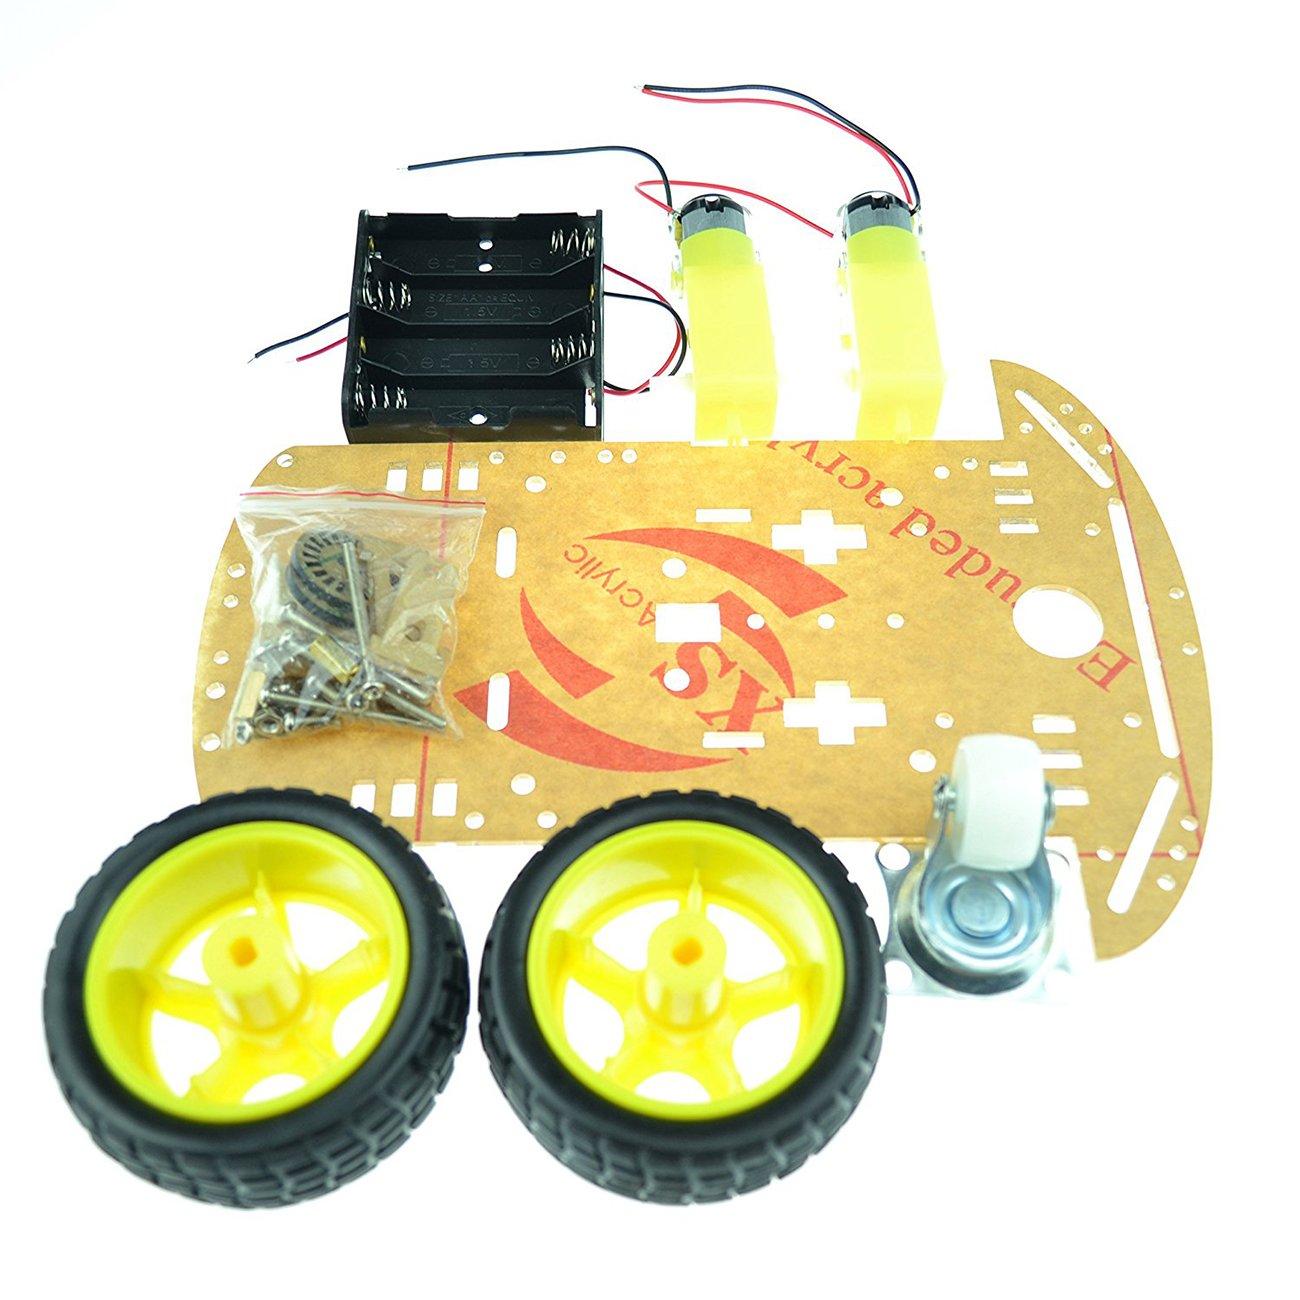 Laqiya 2WD Smart Robot Car Chassis Kit with Speed Encoder Battery Box Arduino 2 Motor 1:48